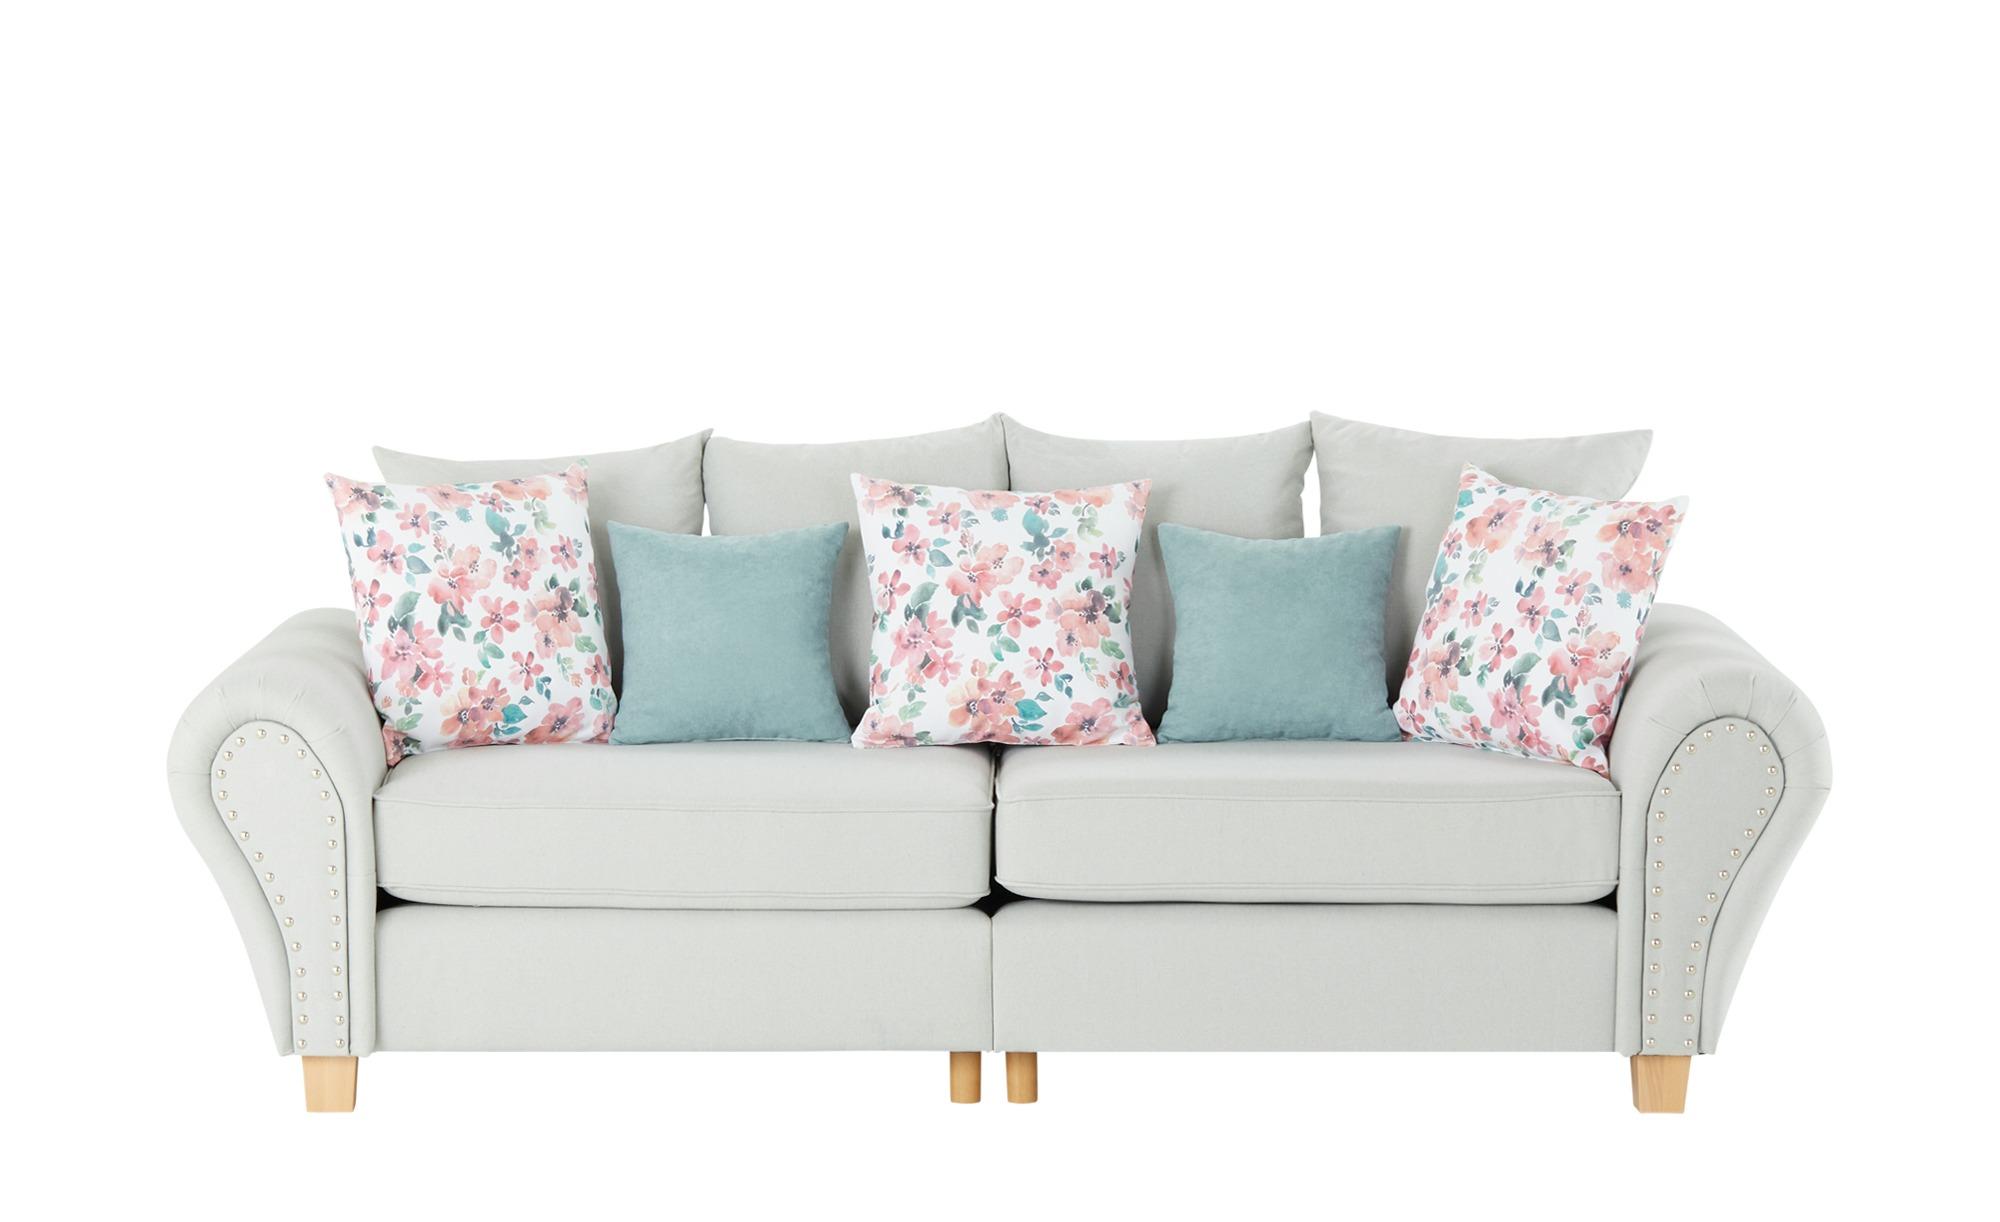 Big Sofa  Vinona ¦ grün ¦ Maße (cm): B: 264 H: 102 T: 108 Polstermöbel > Sofas > Big-Sofas - Höffner